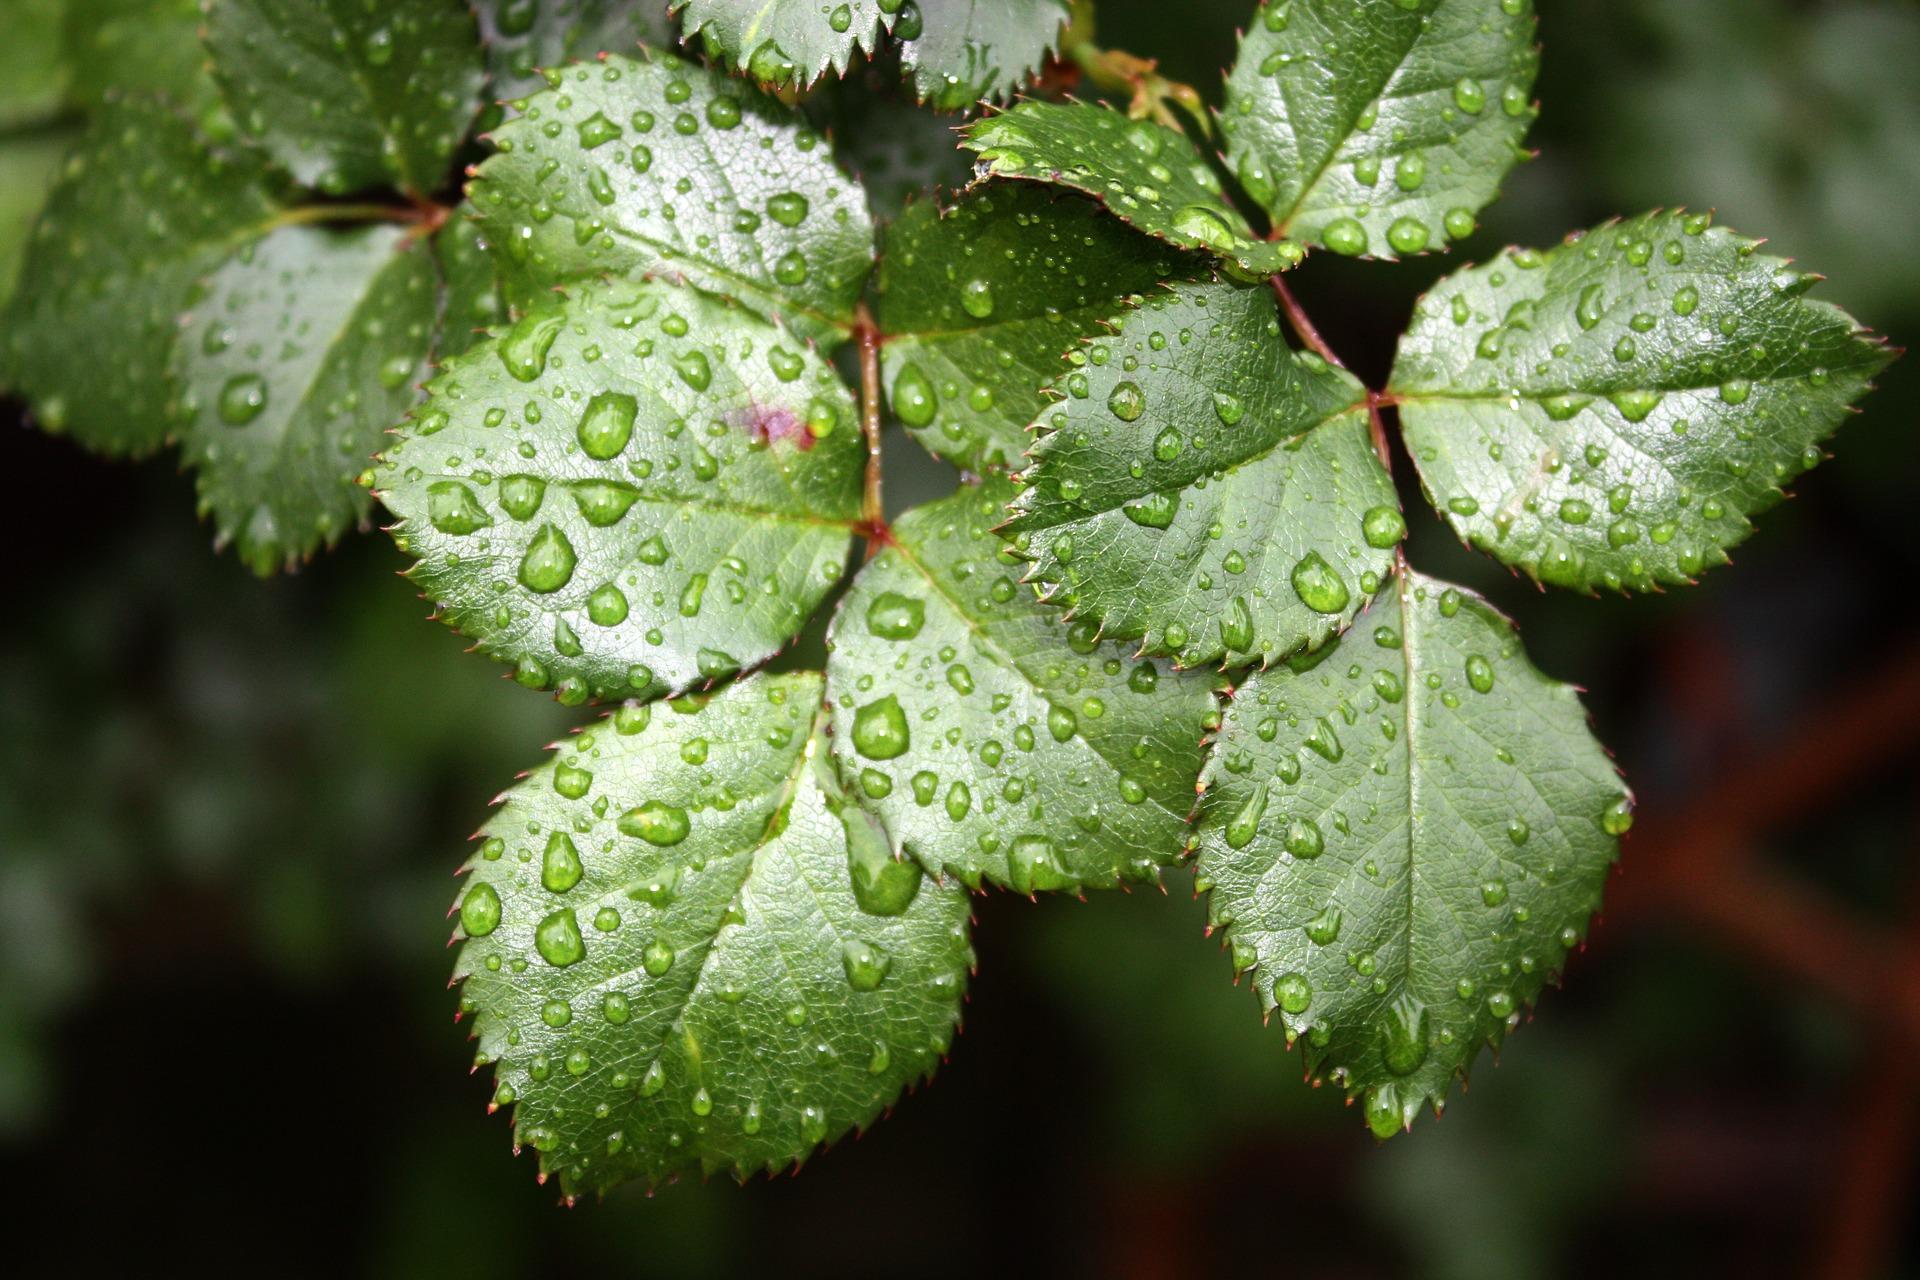 Plants Panic When It Rains